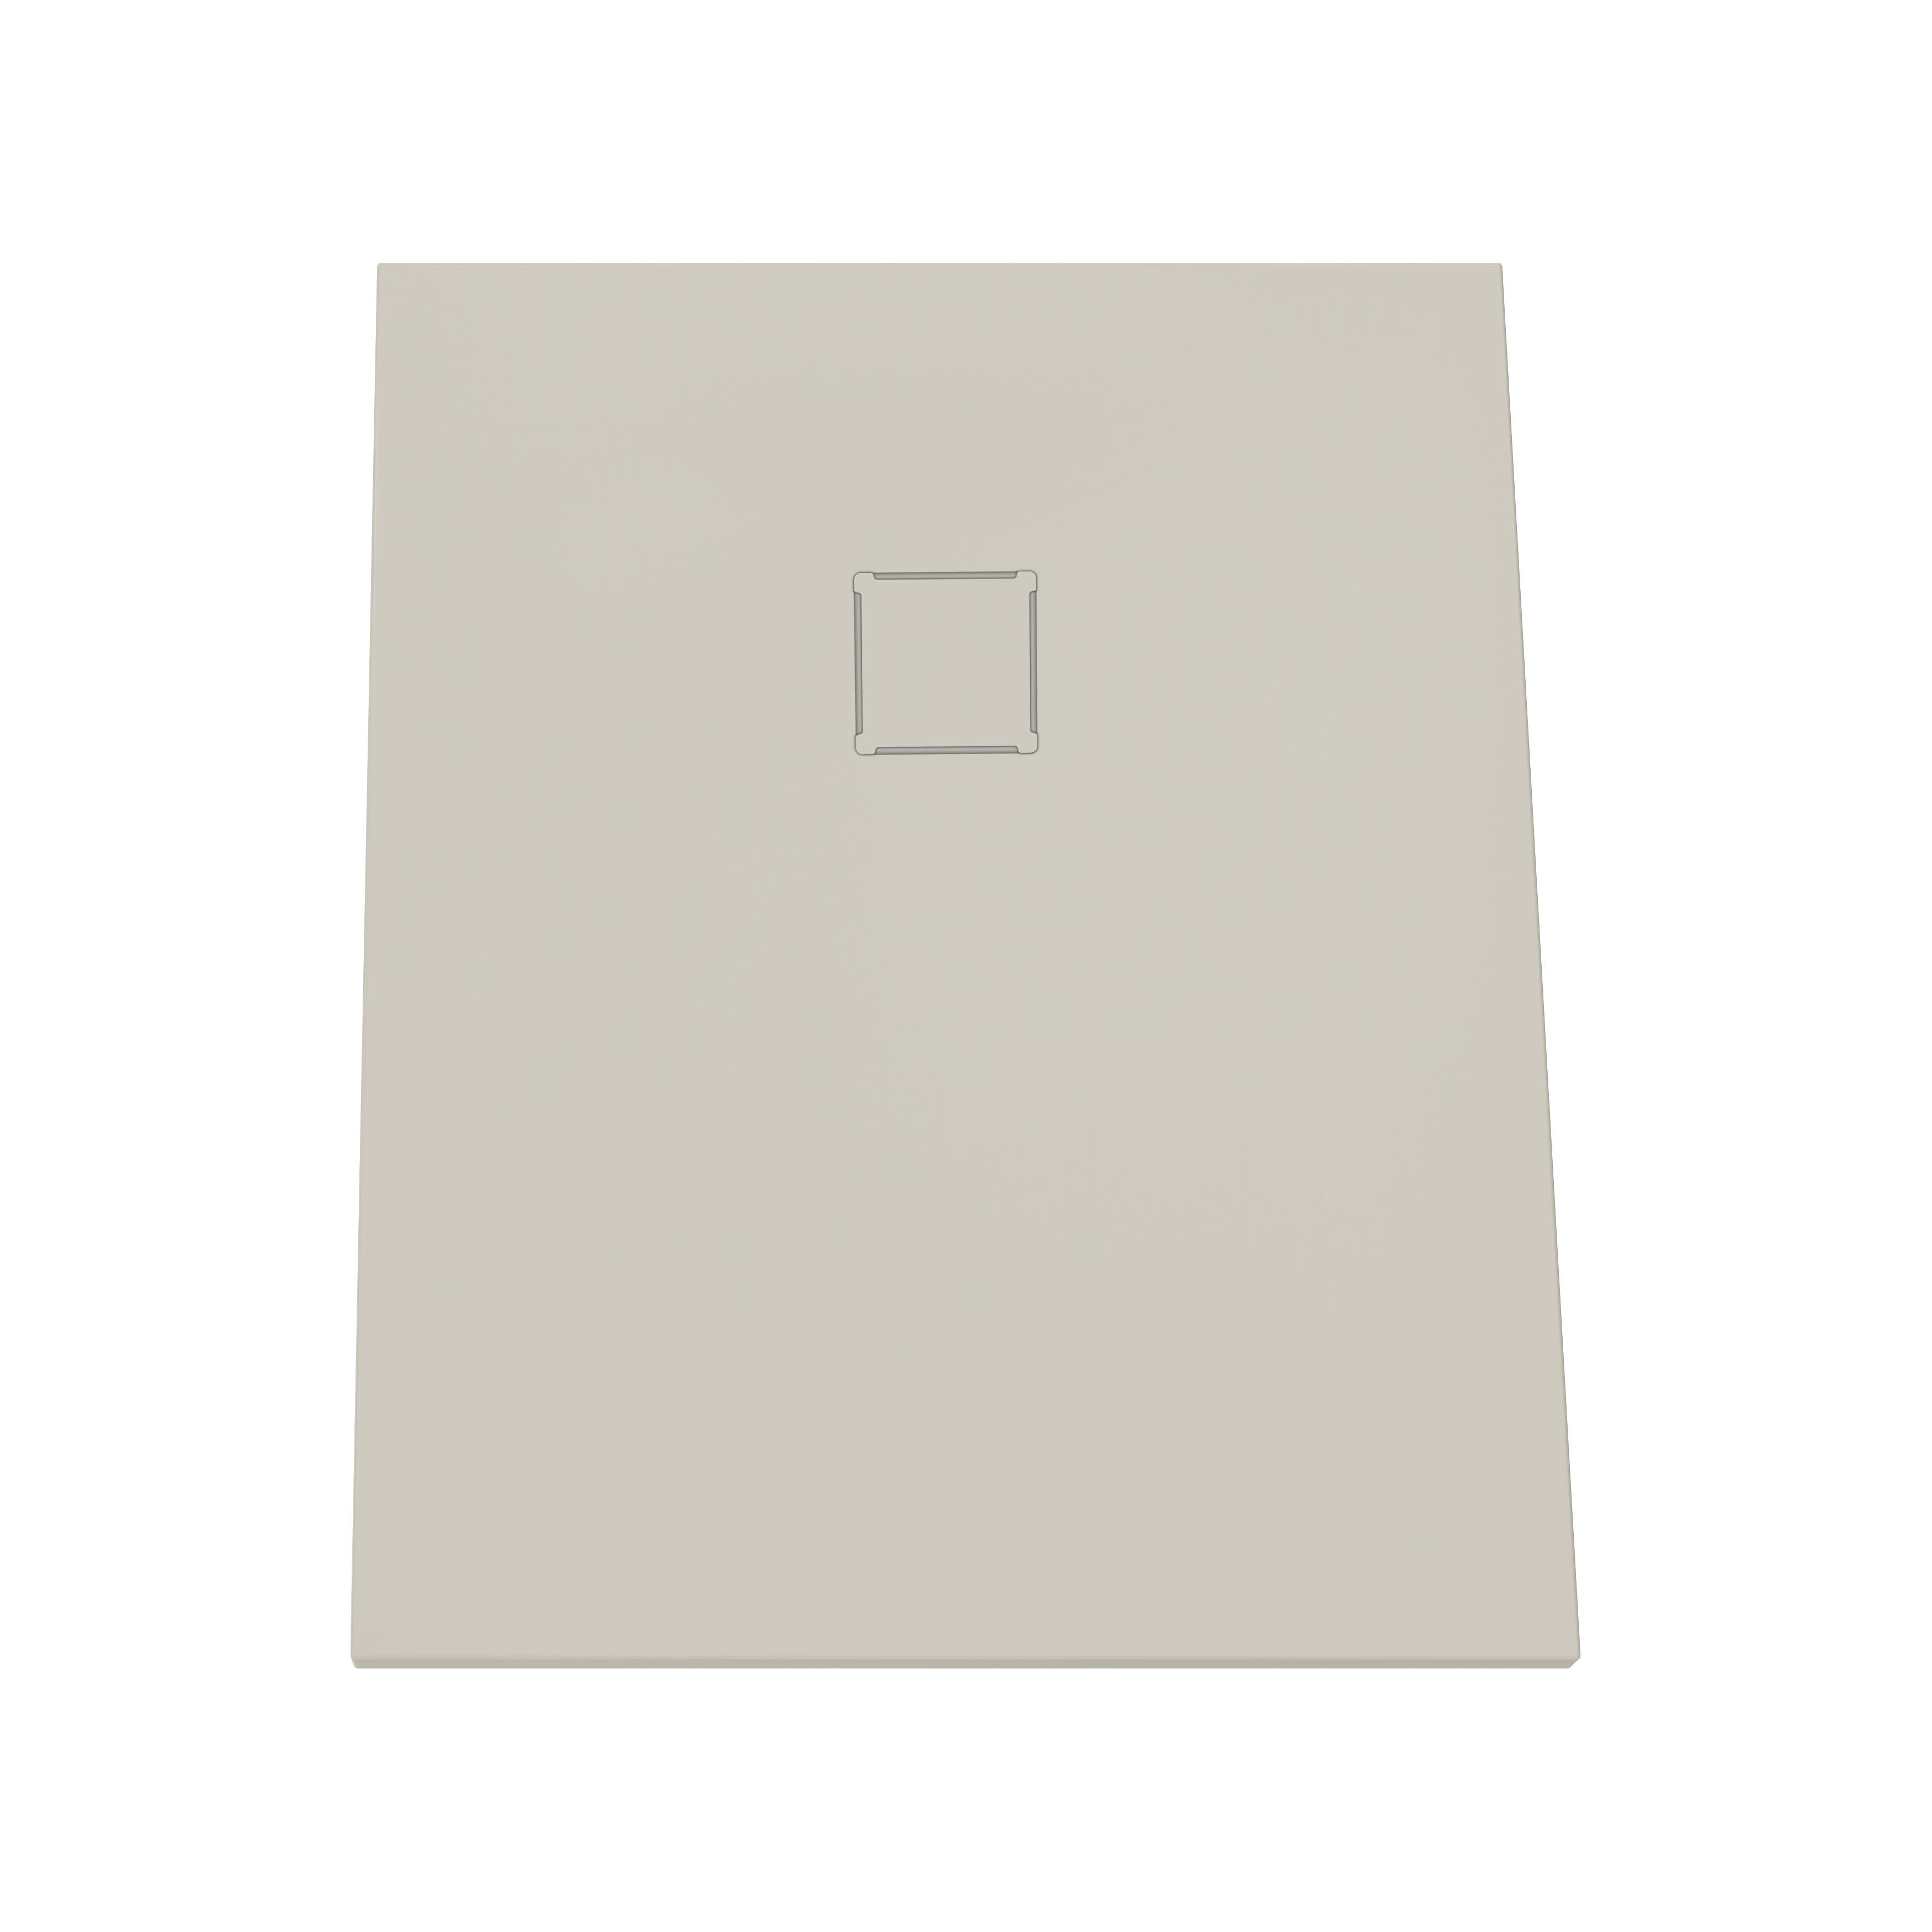 V-stone, receveur ultra plat en solid stone, 100  x  80 cm, taupe